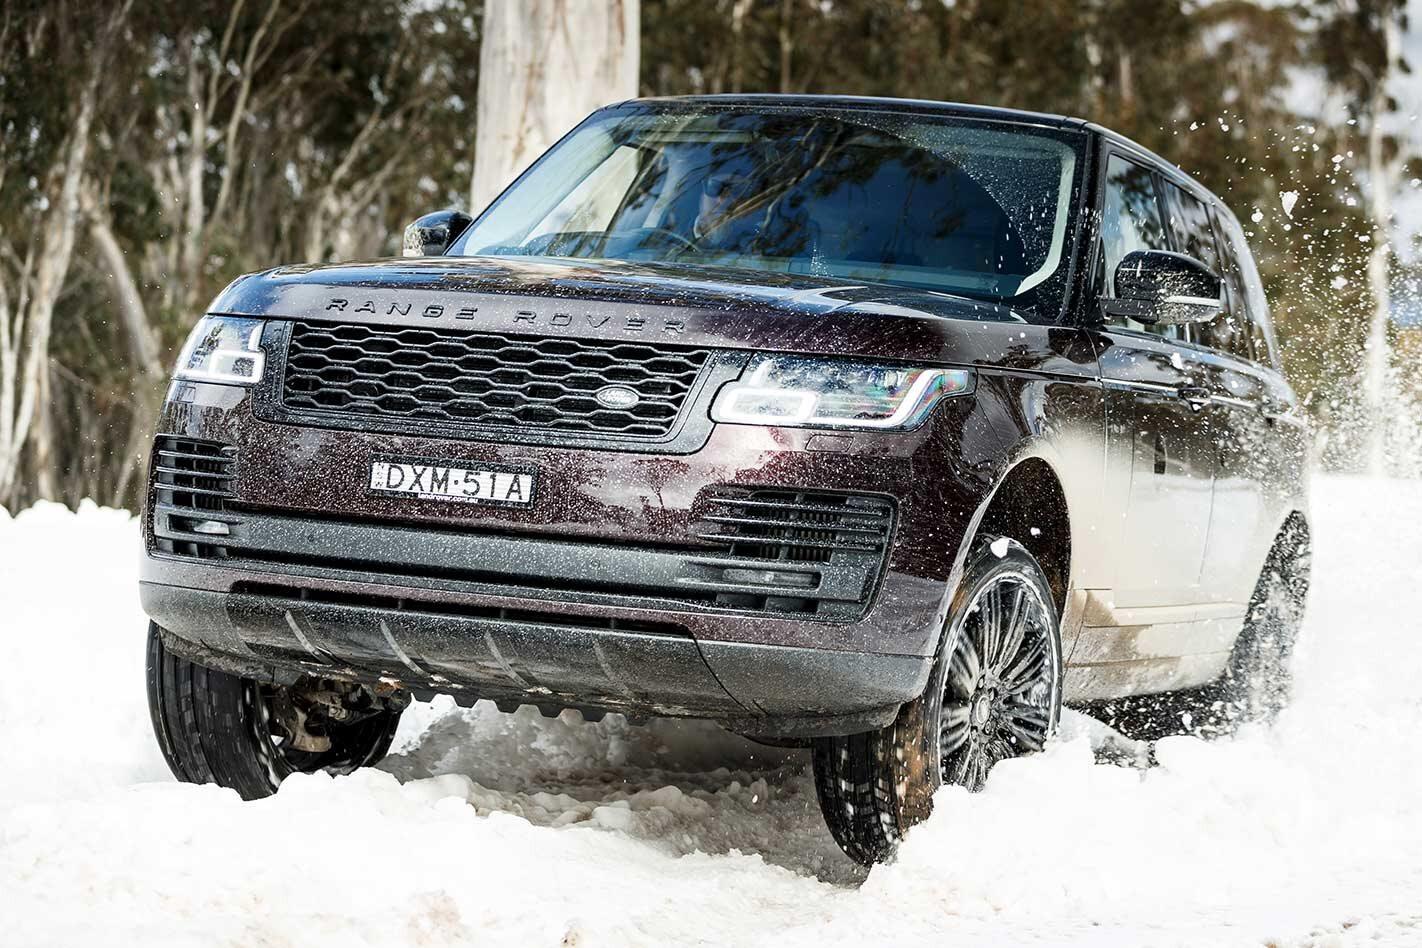 2018 Range Rover Autobiography SDV8 4x4 review